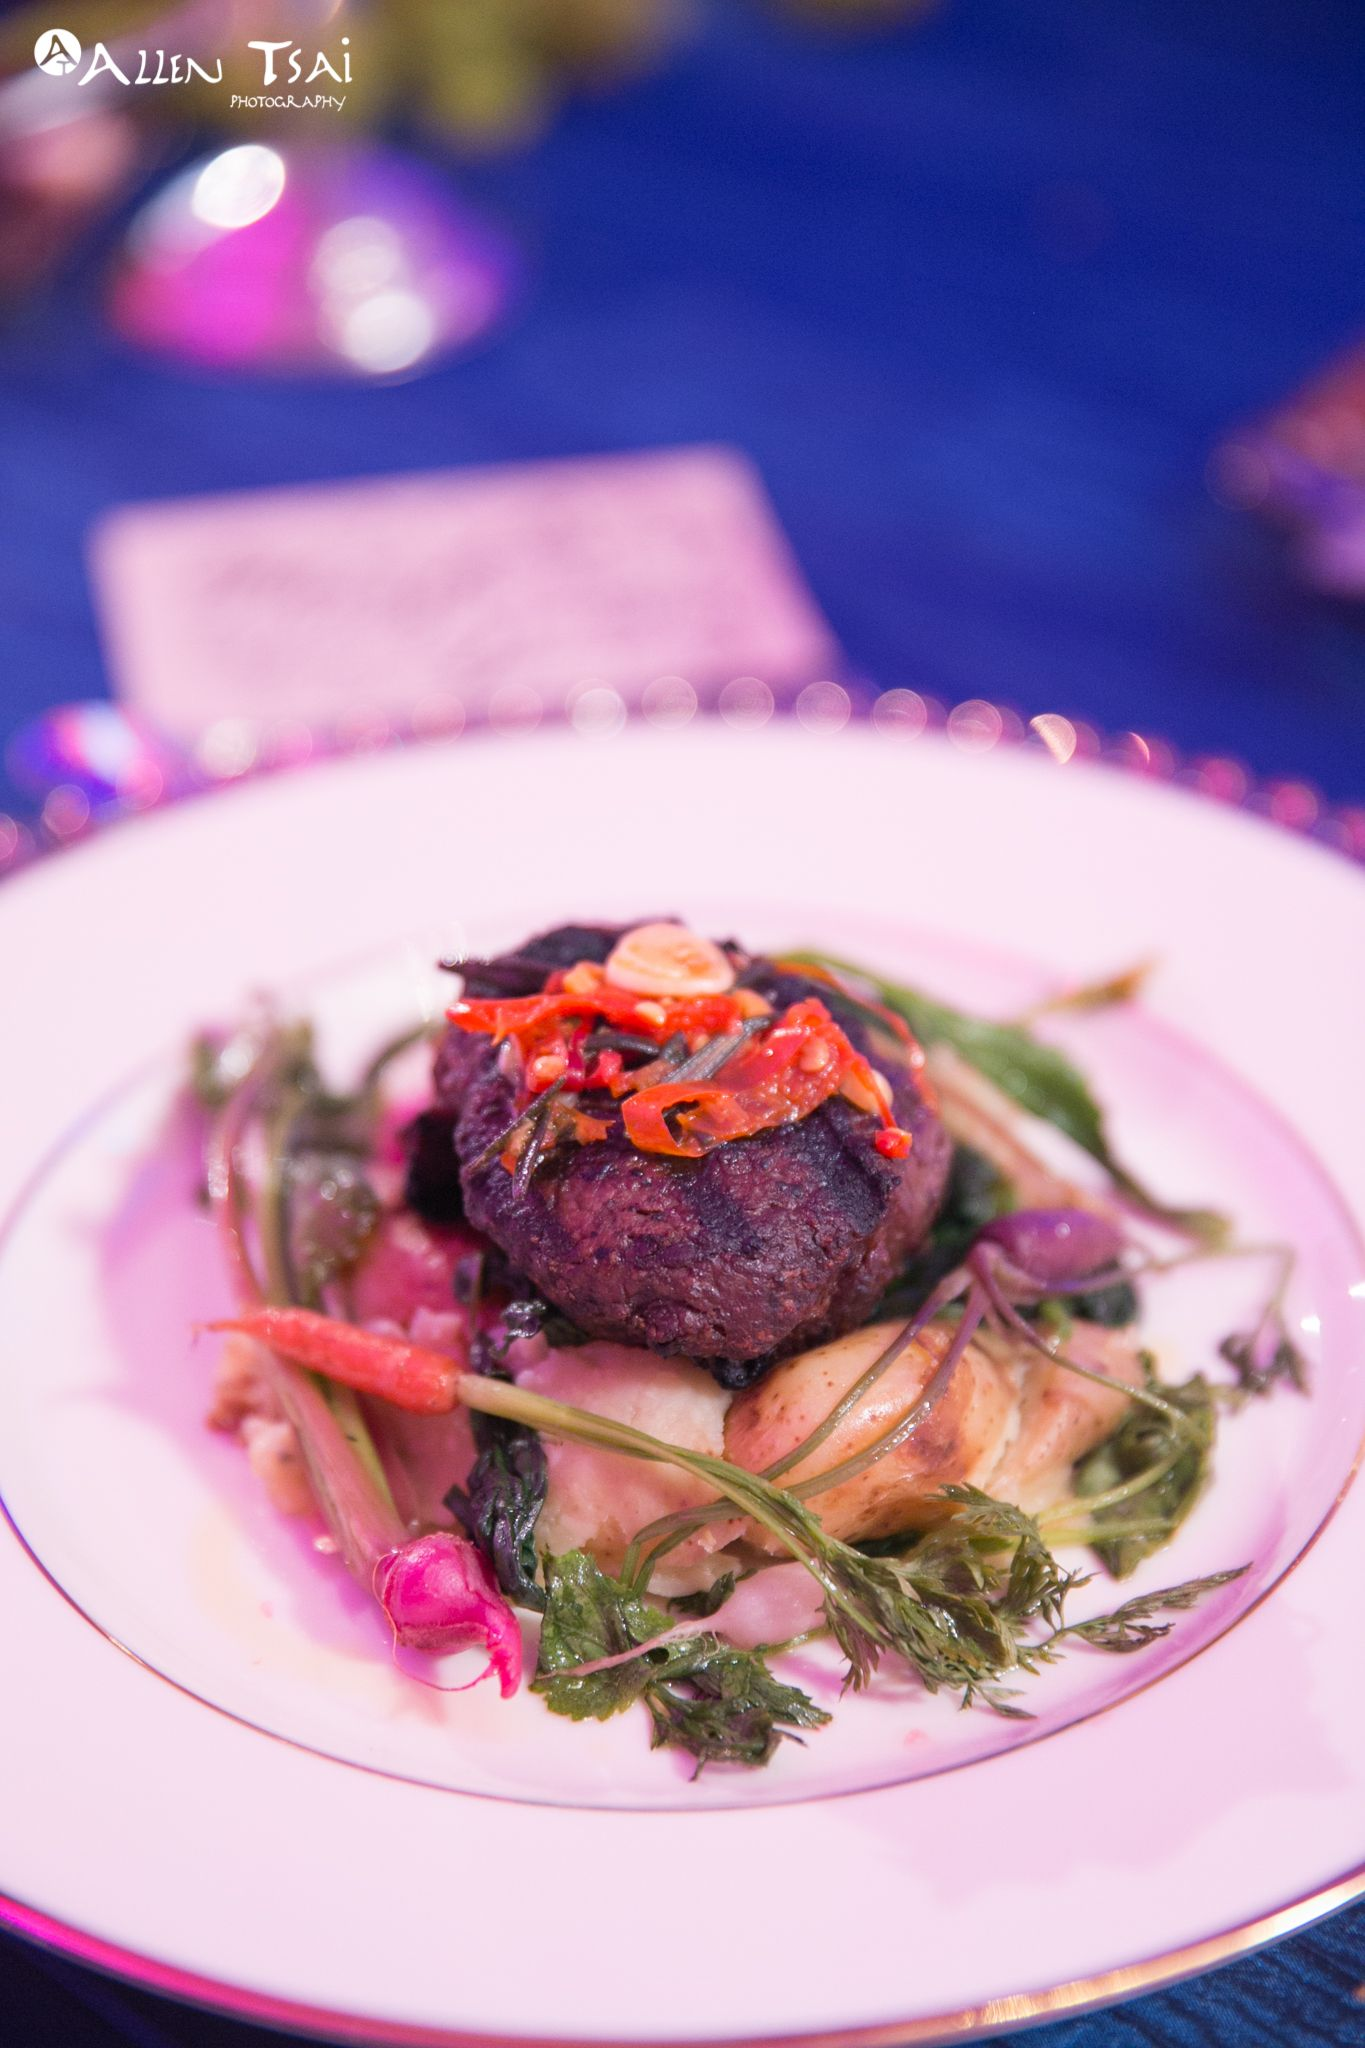 Petite Filet #foodie #plated #prairieballroom #hiltongranitepark ...